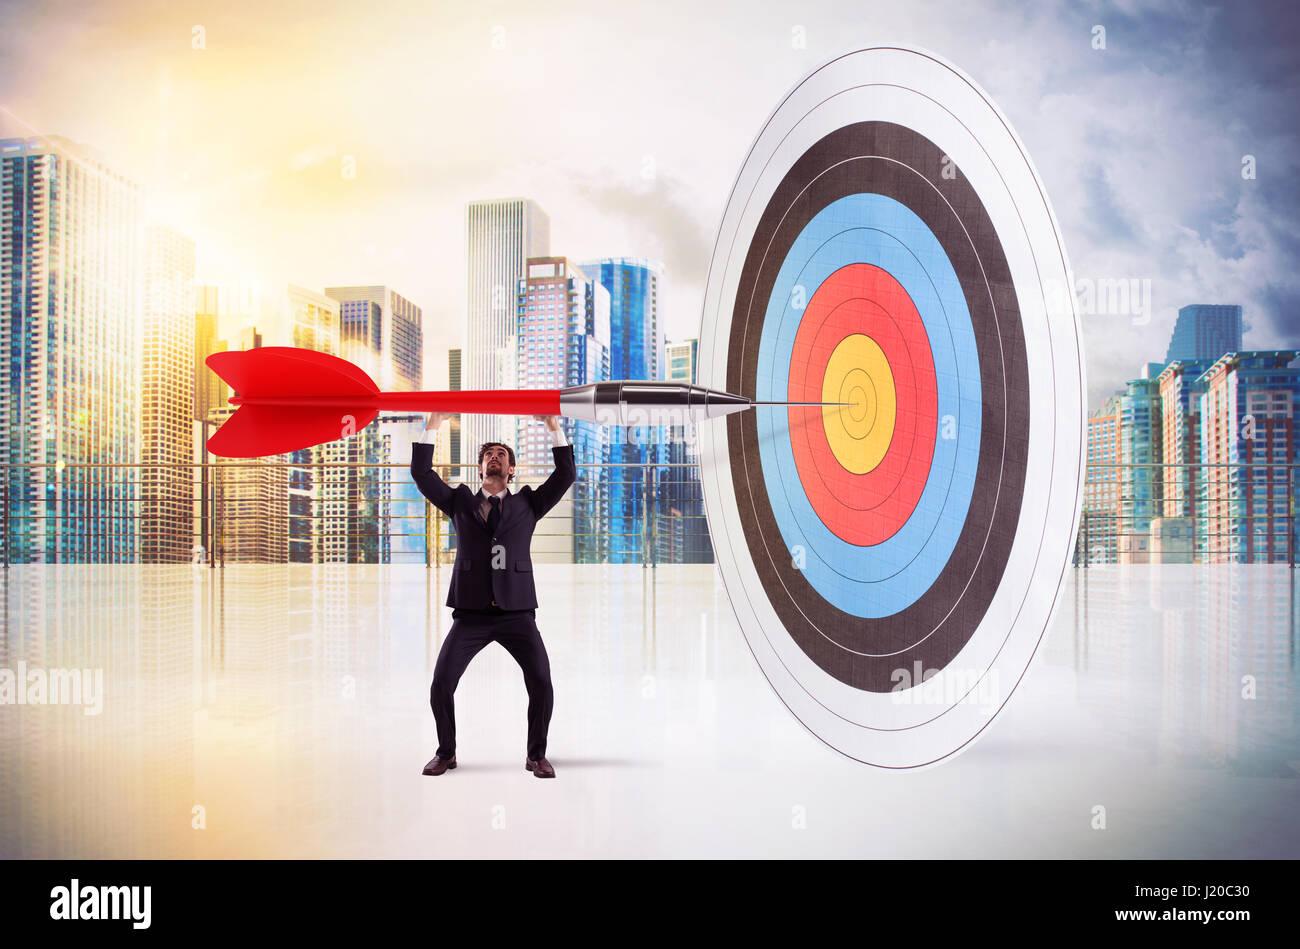 Aim the center - Stock Image